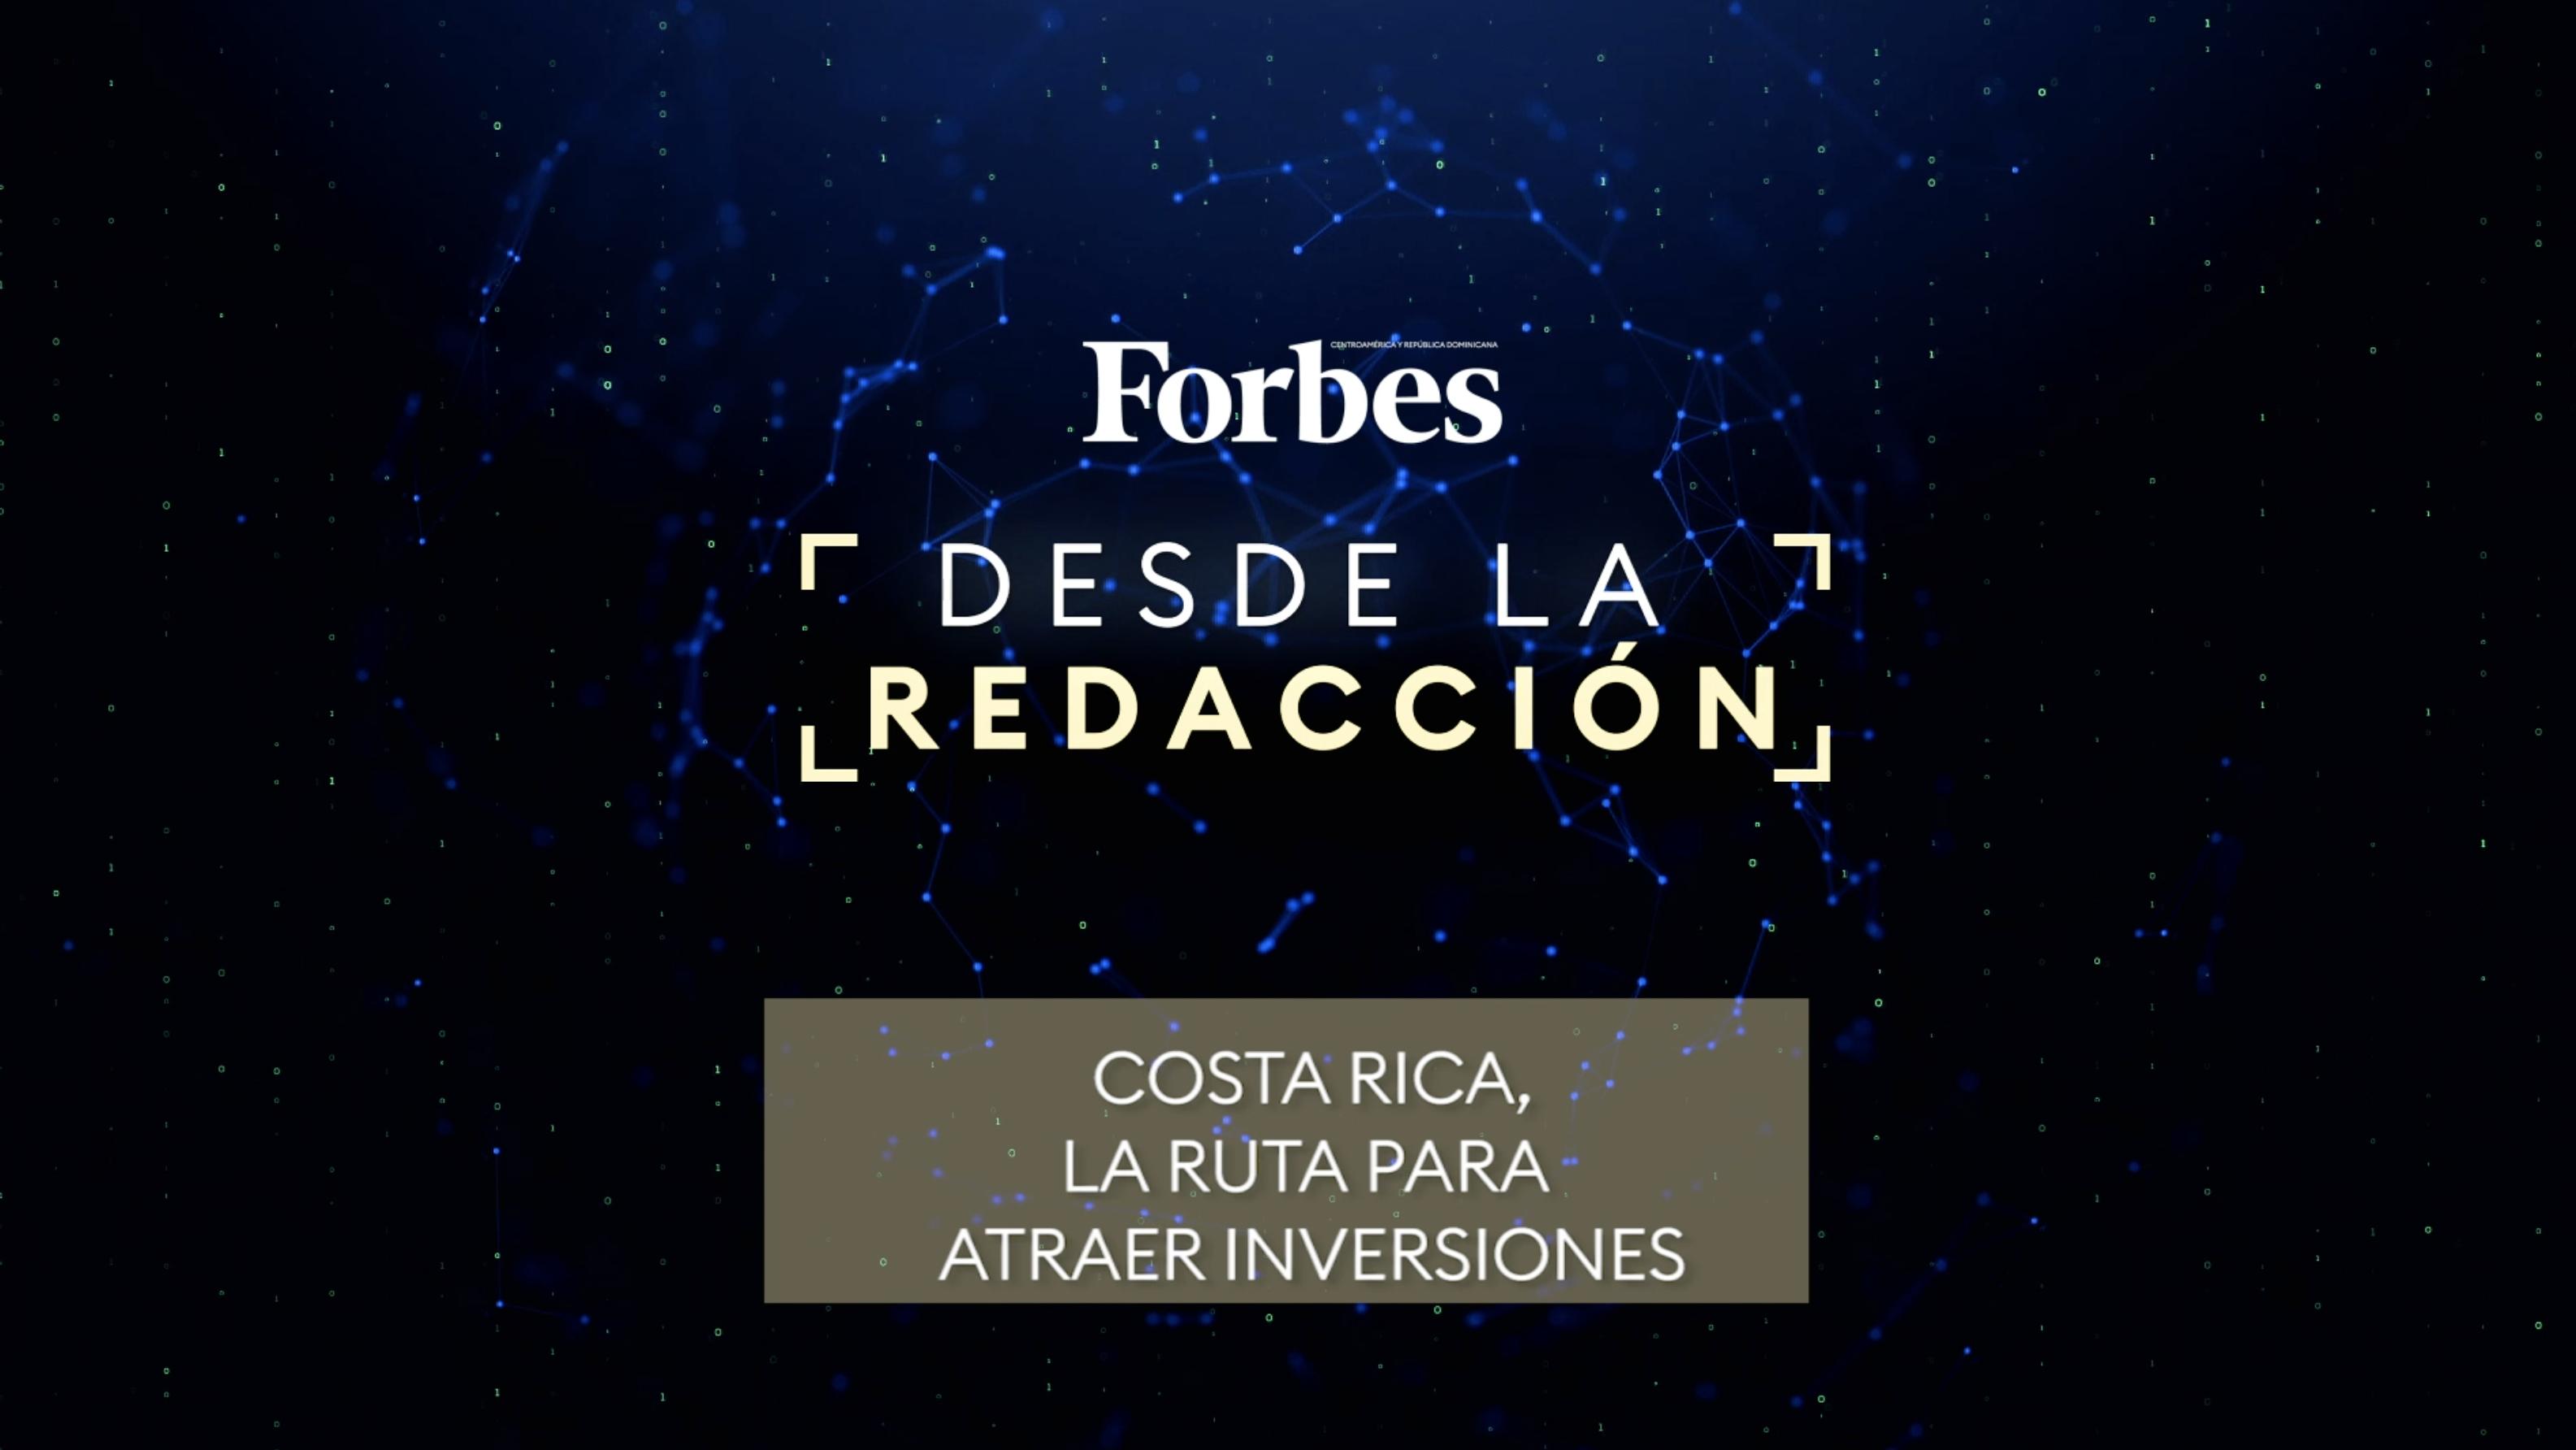 Costa Rica, la ruta para atraer inversiones